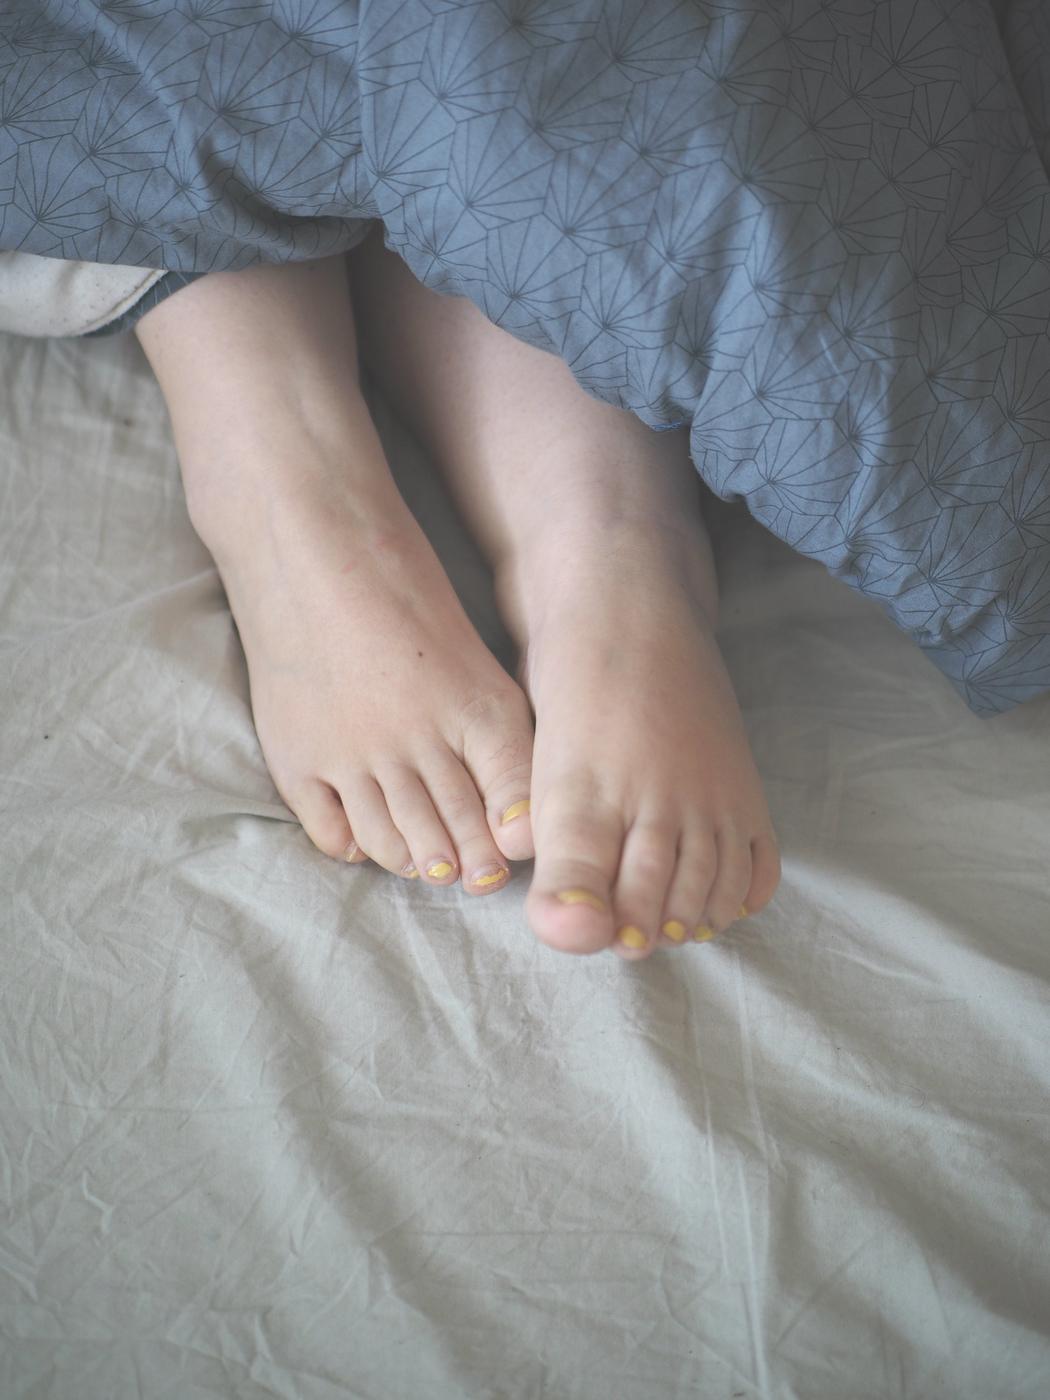 bedroomfeet2.jpg